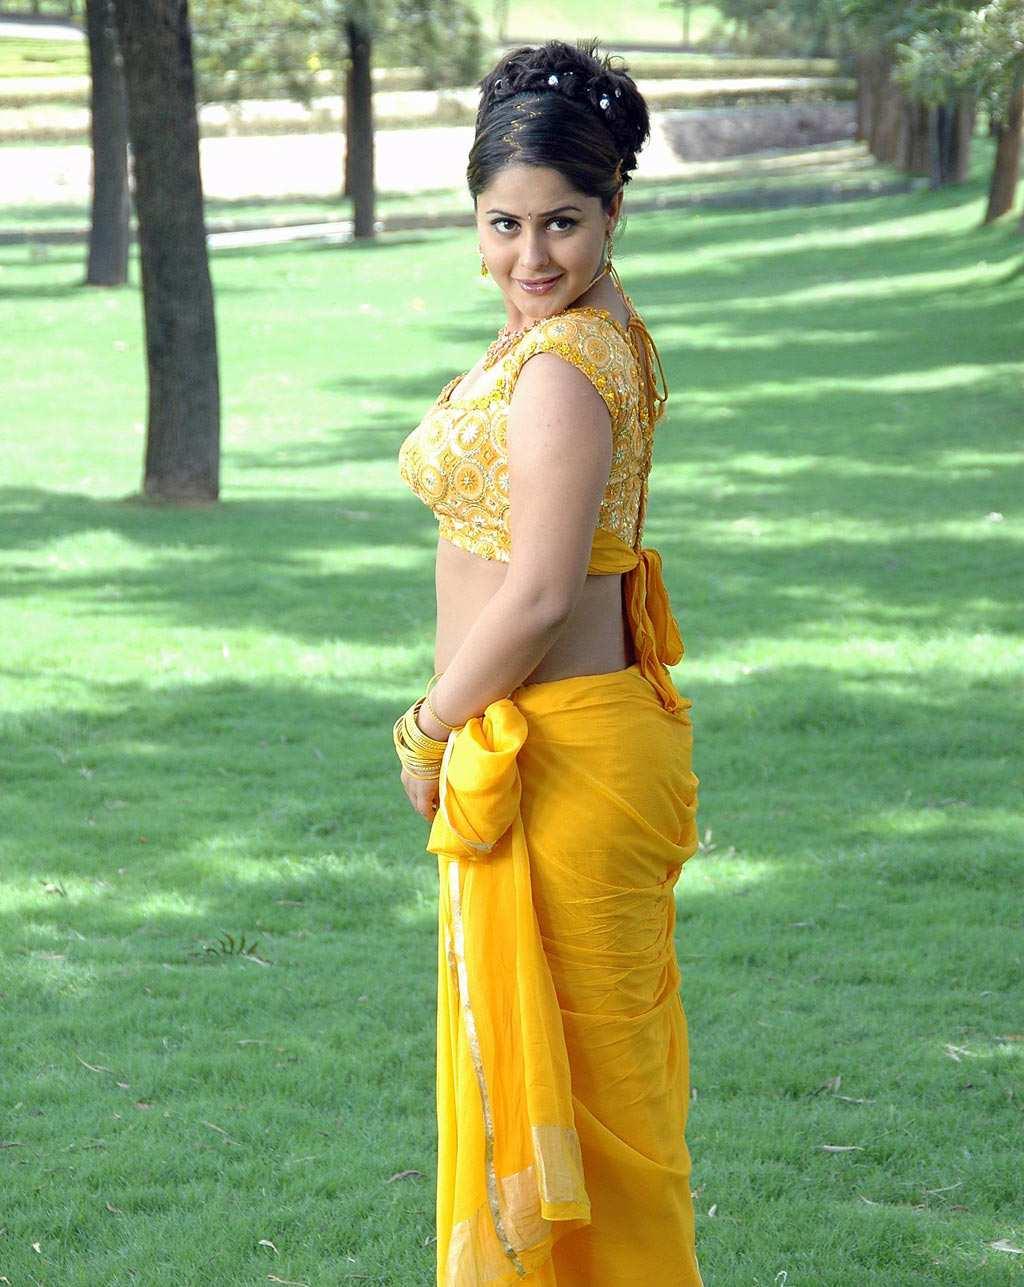 http://1.bp.blogspot.com/-tFAjQykWz4A/T0nm_WhUEmI/AAAAAAAAAeo/BhBjOF3bn5E/s1600/actress-farzana-yellow-saree-navel-show_actressinsareephotos_blogspot_com_228.jpg